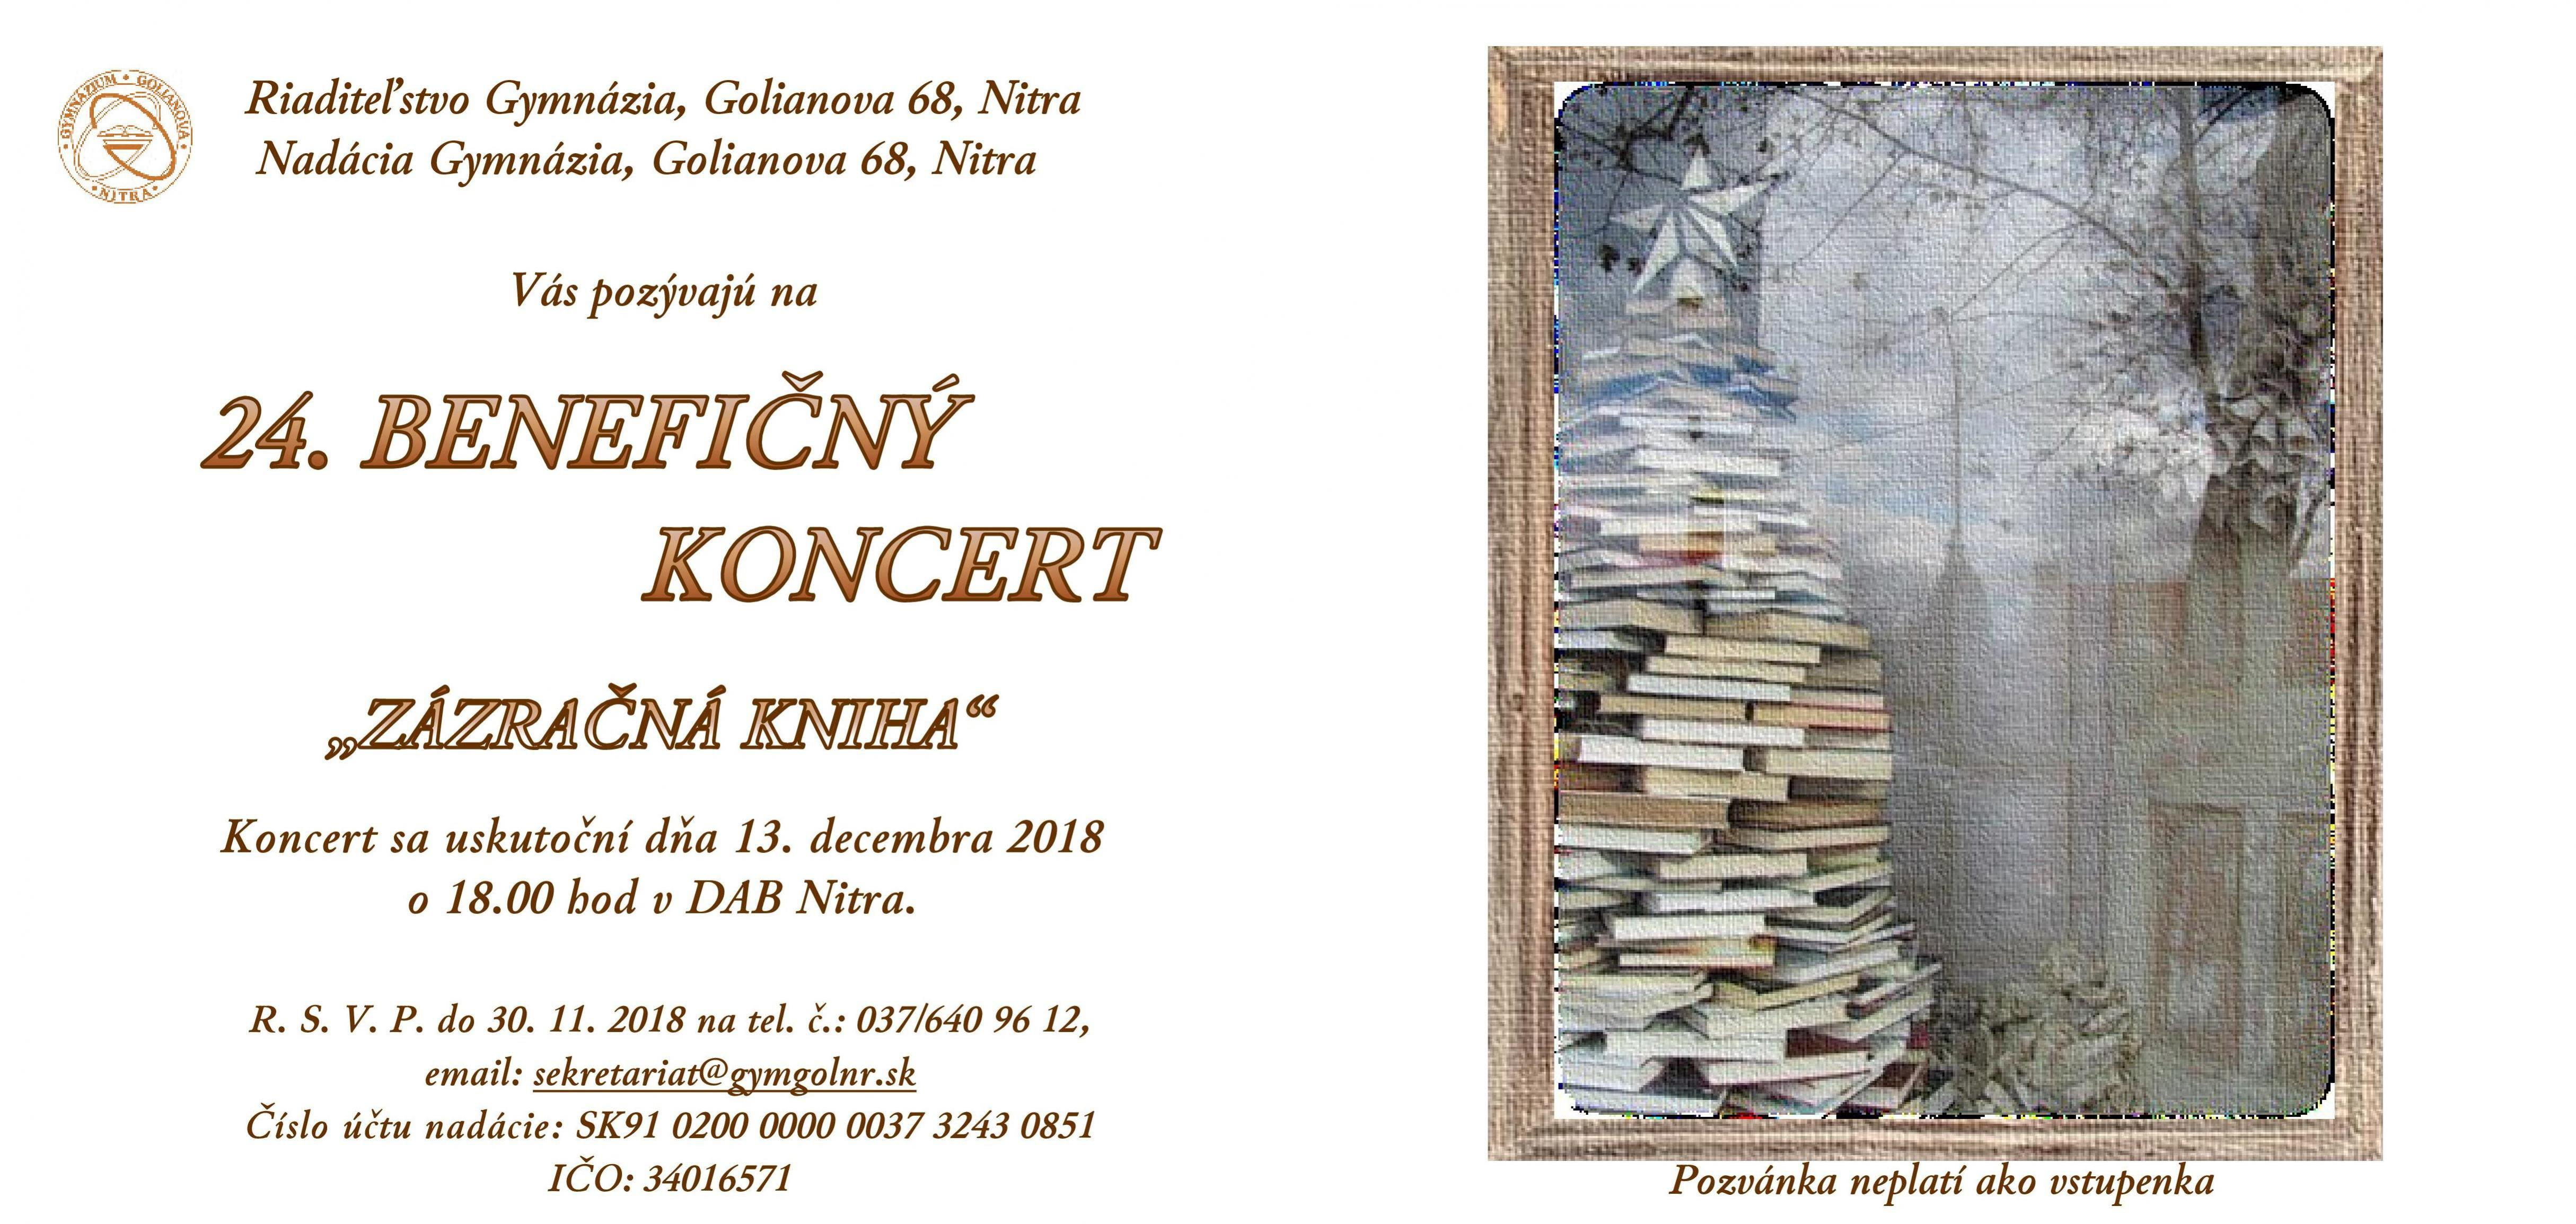 Golianko v Nitre benefičný koncert